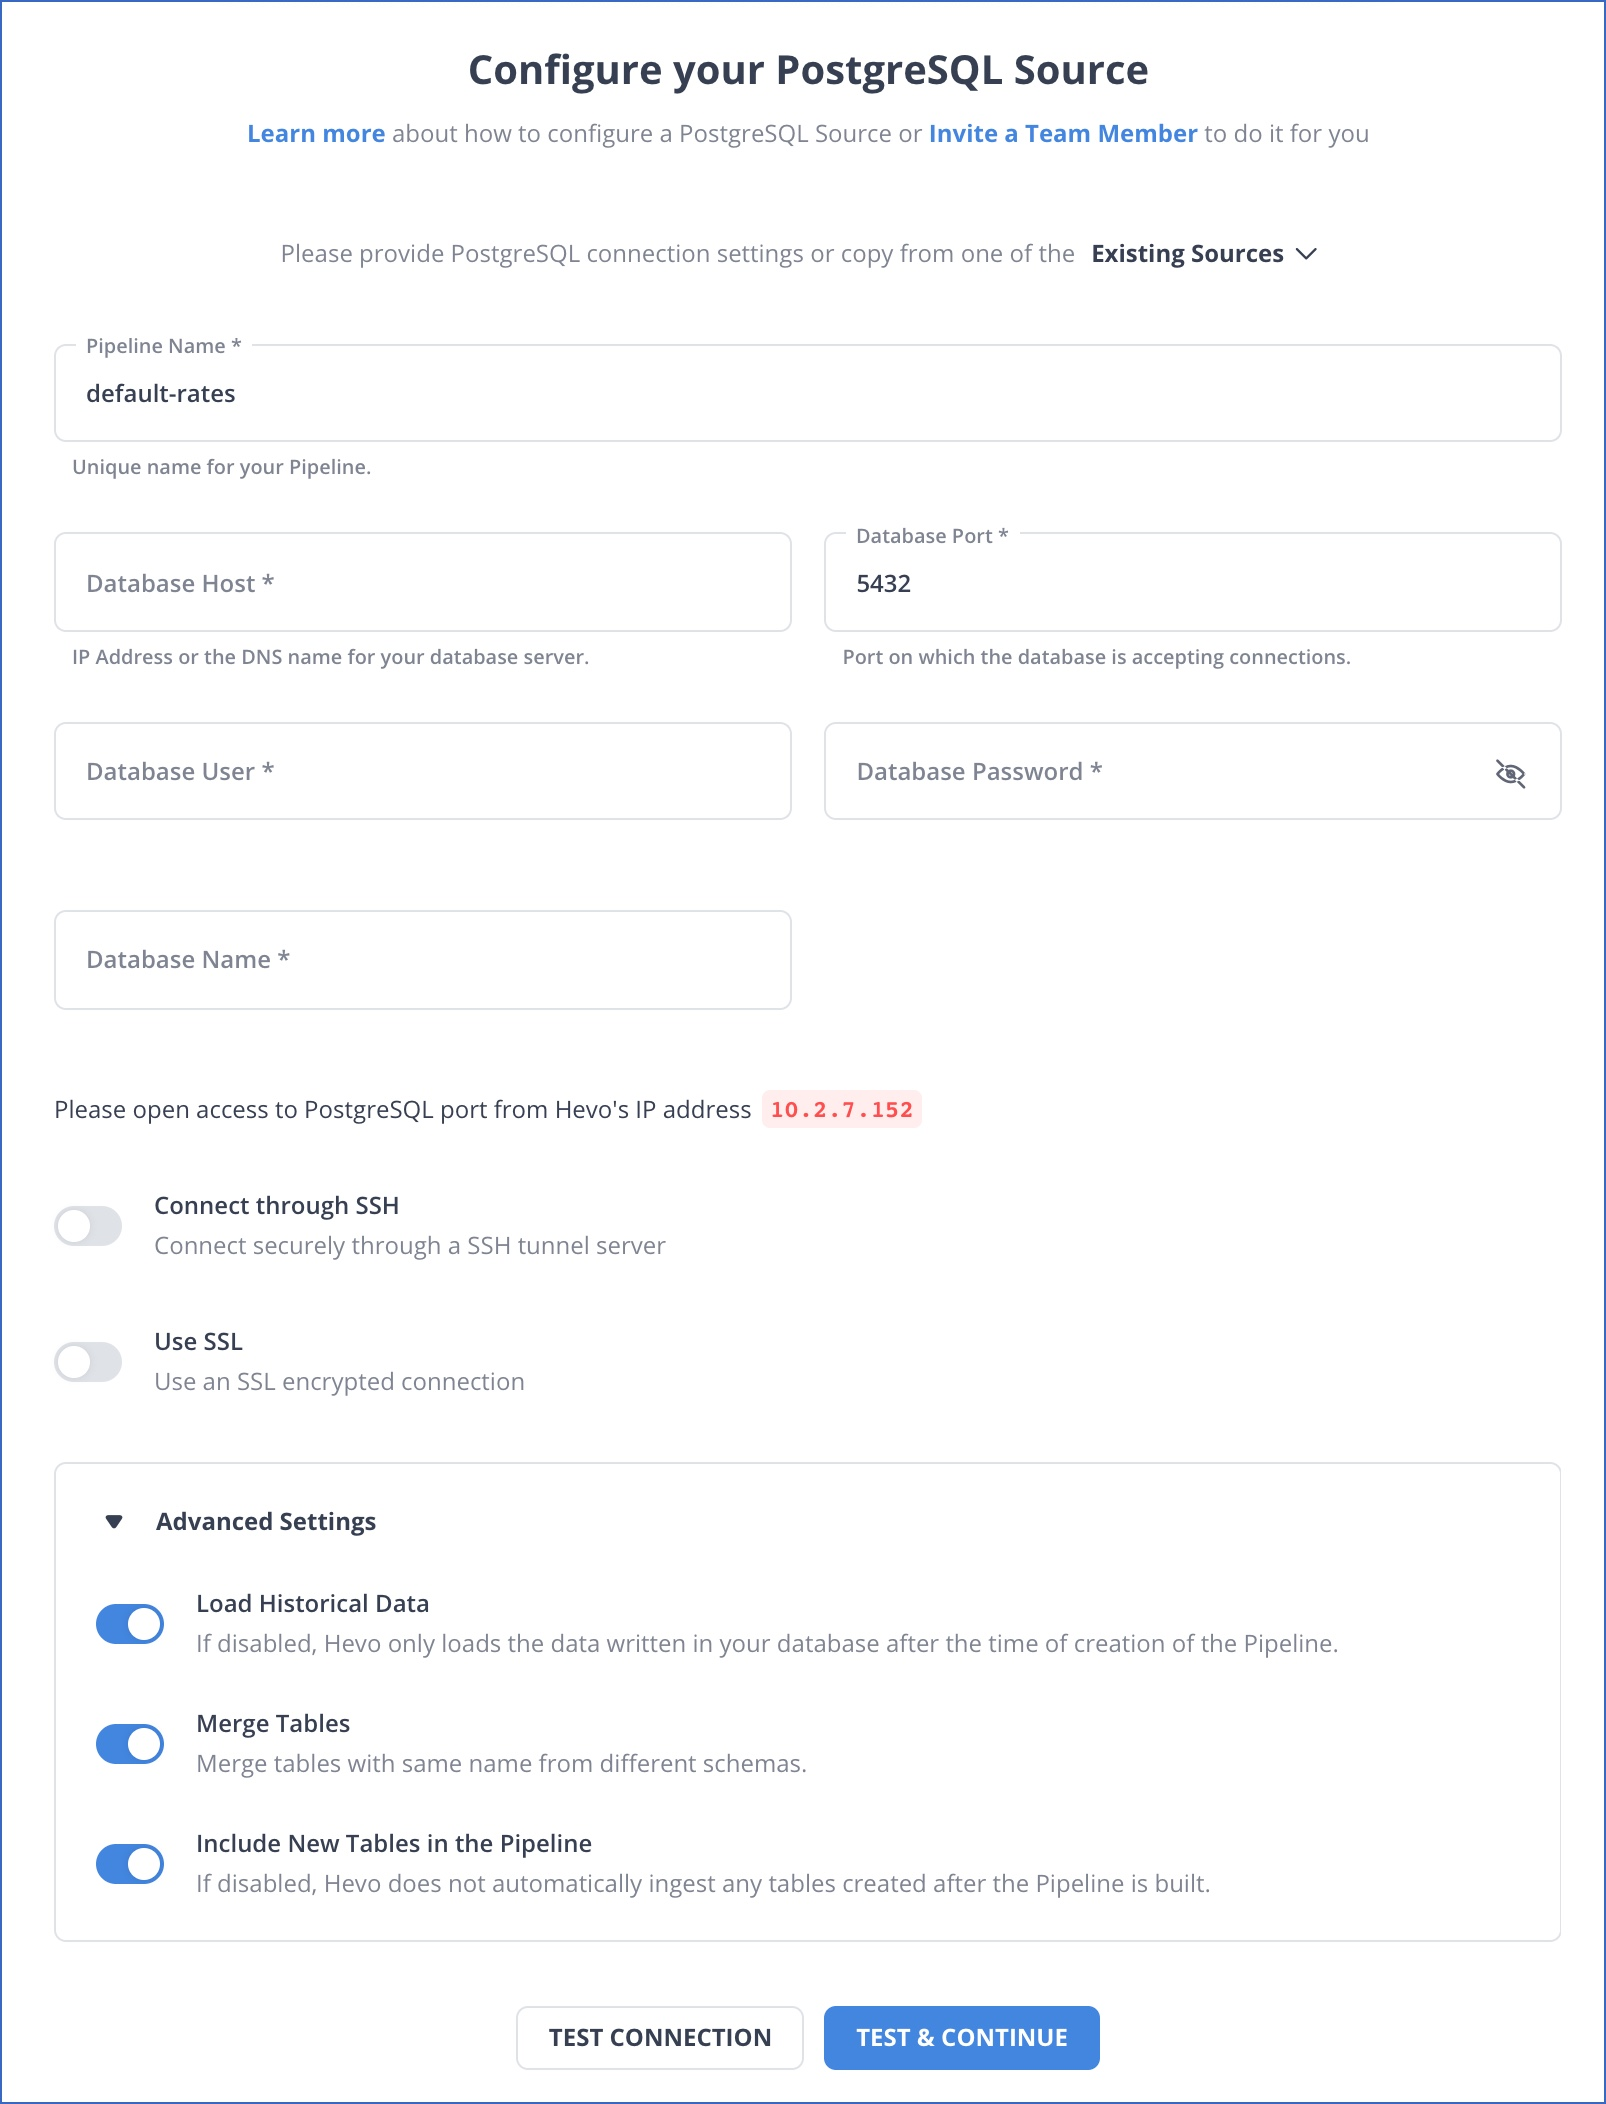 PostgreSQL settings